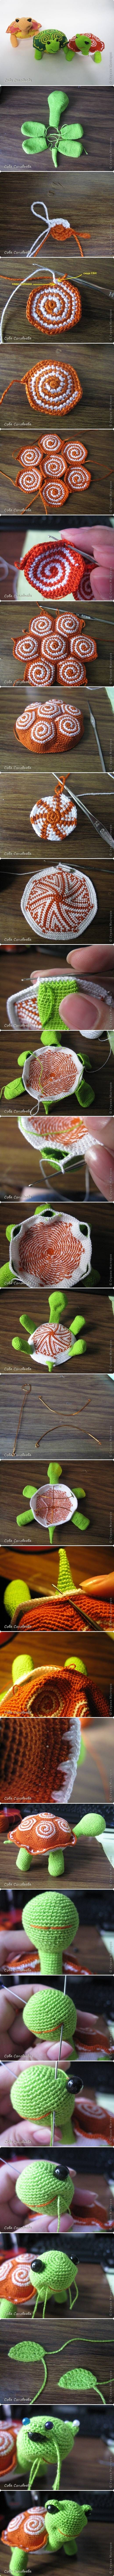 DIY Little Crochet Turtle  Schildkröte häckeln Kuscheltier Anleitung